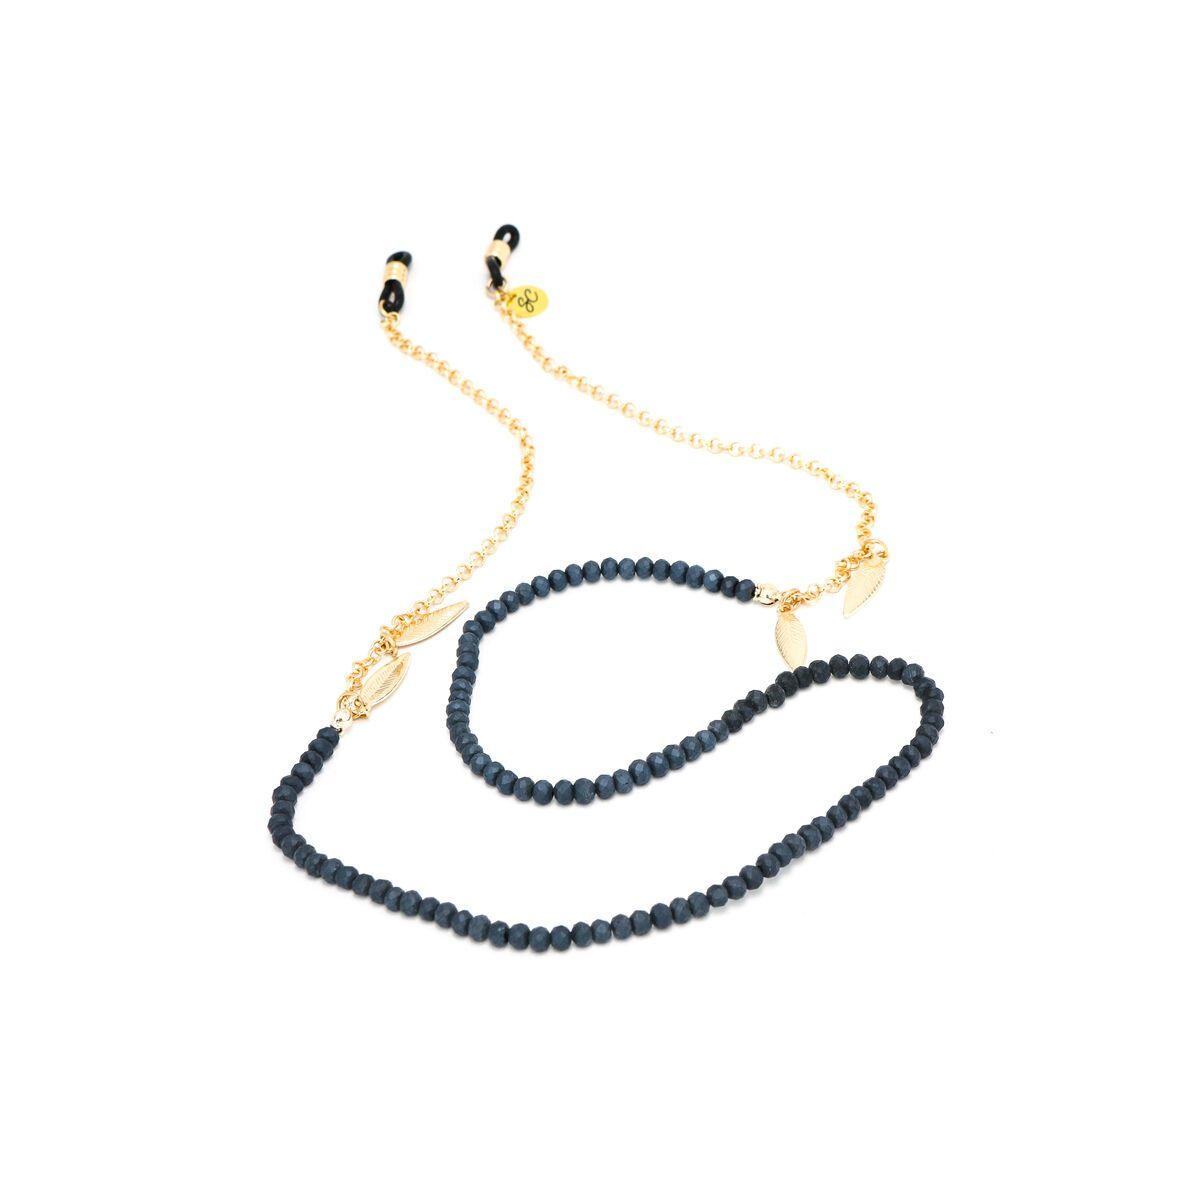 Sunny Cords Dark Blue Sunglass Chain - Bead It